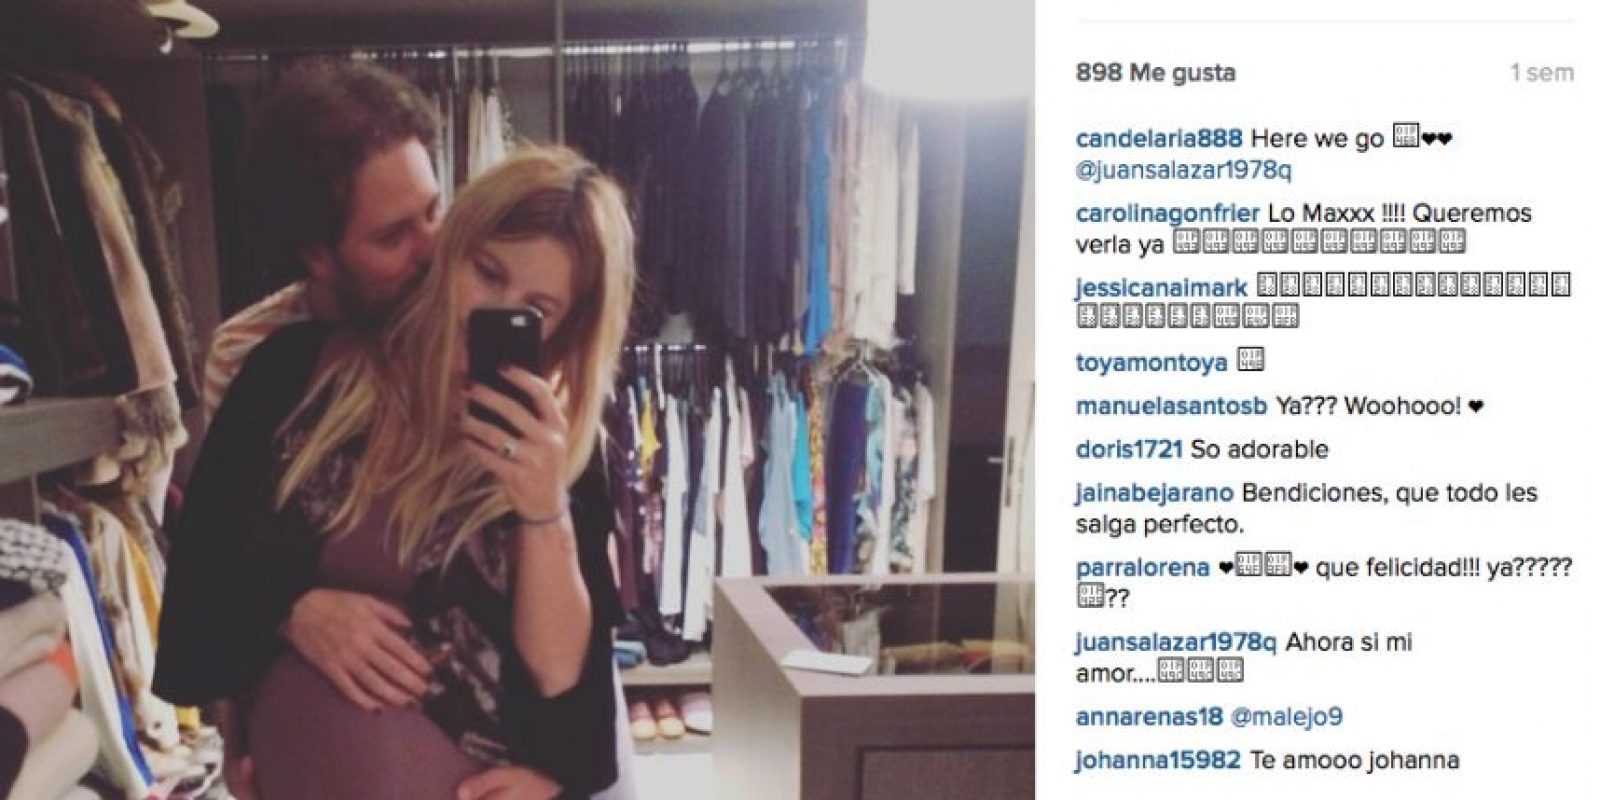 Foto:Instagram Johana Bahamón @candelaria888